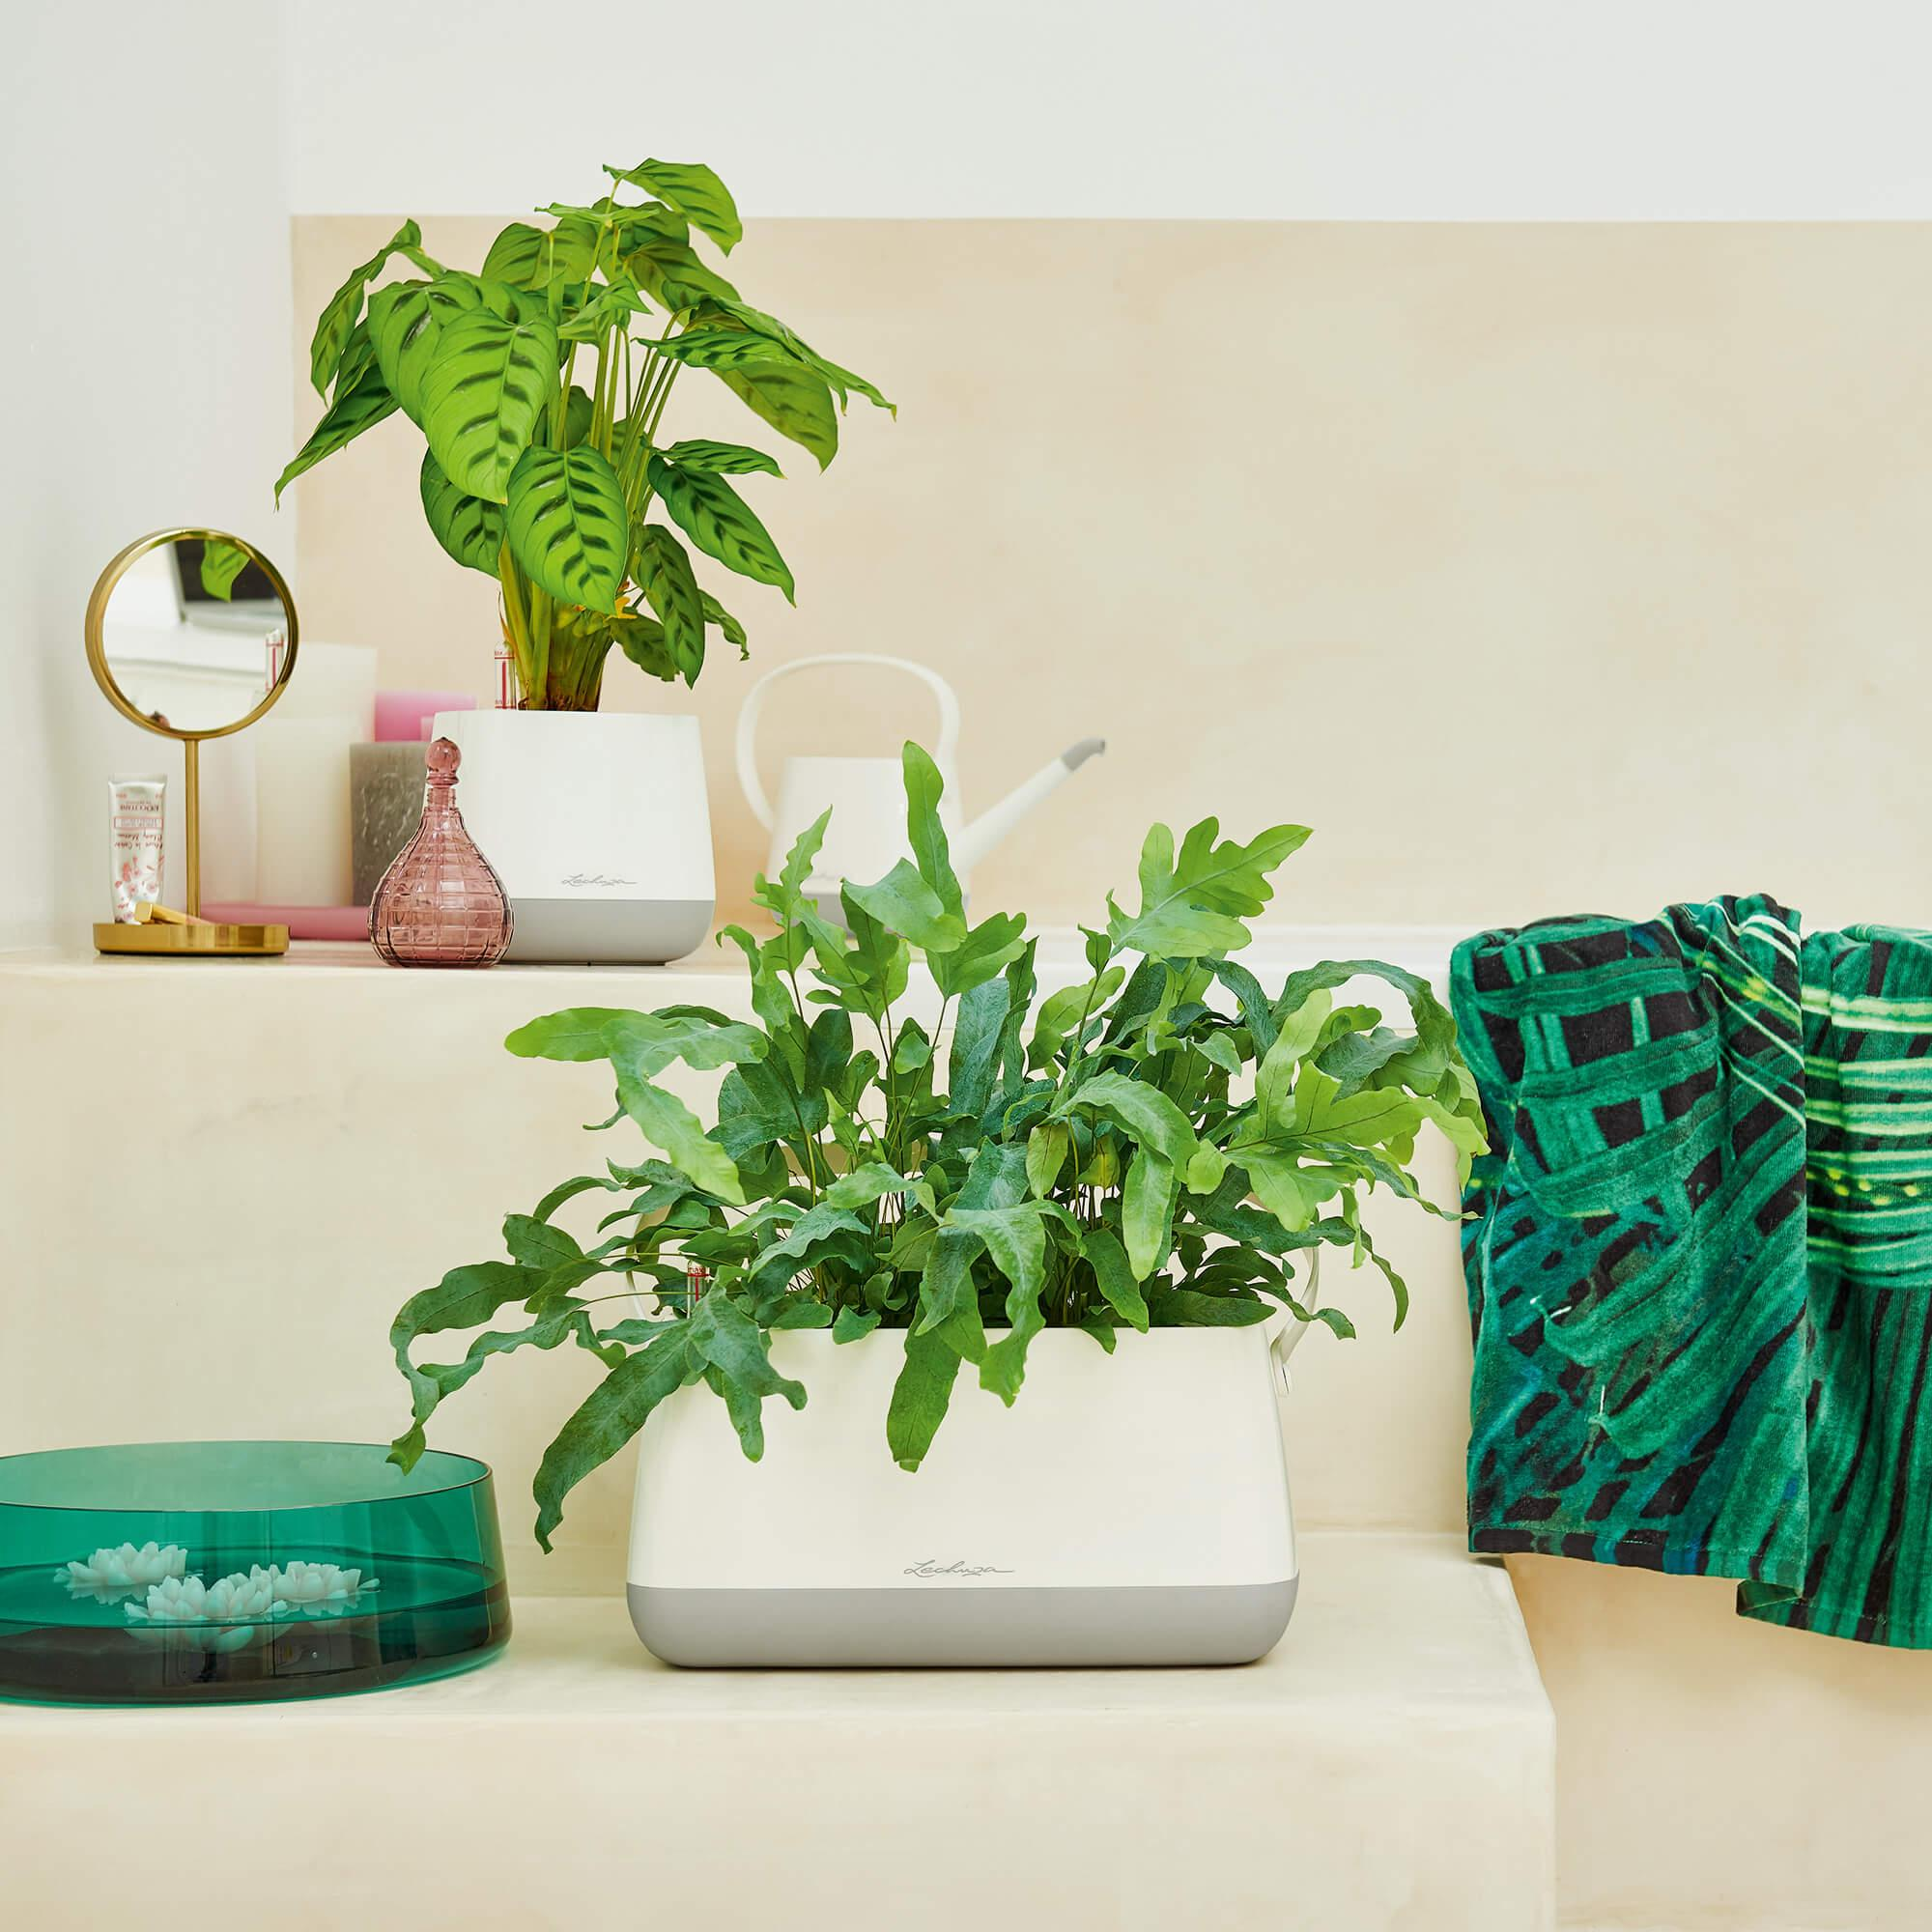 YULA planter white/gray semi-gloss - Image 9